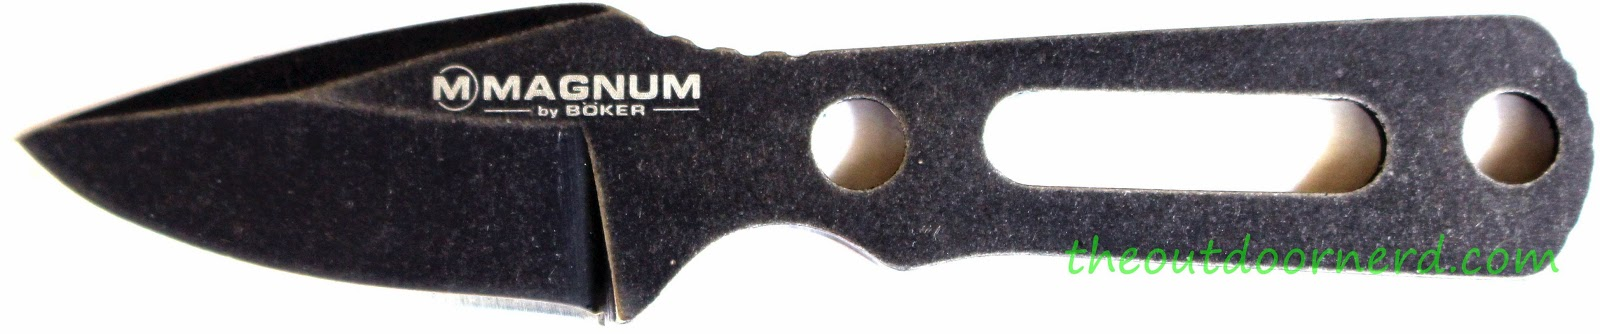 Boker Magnum 'Lil Friend' Arrowhead: Product View 3